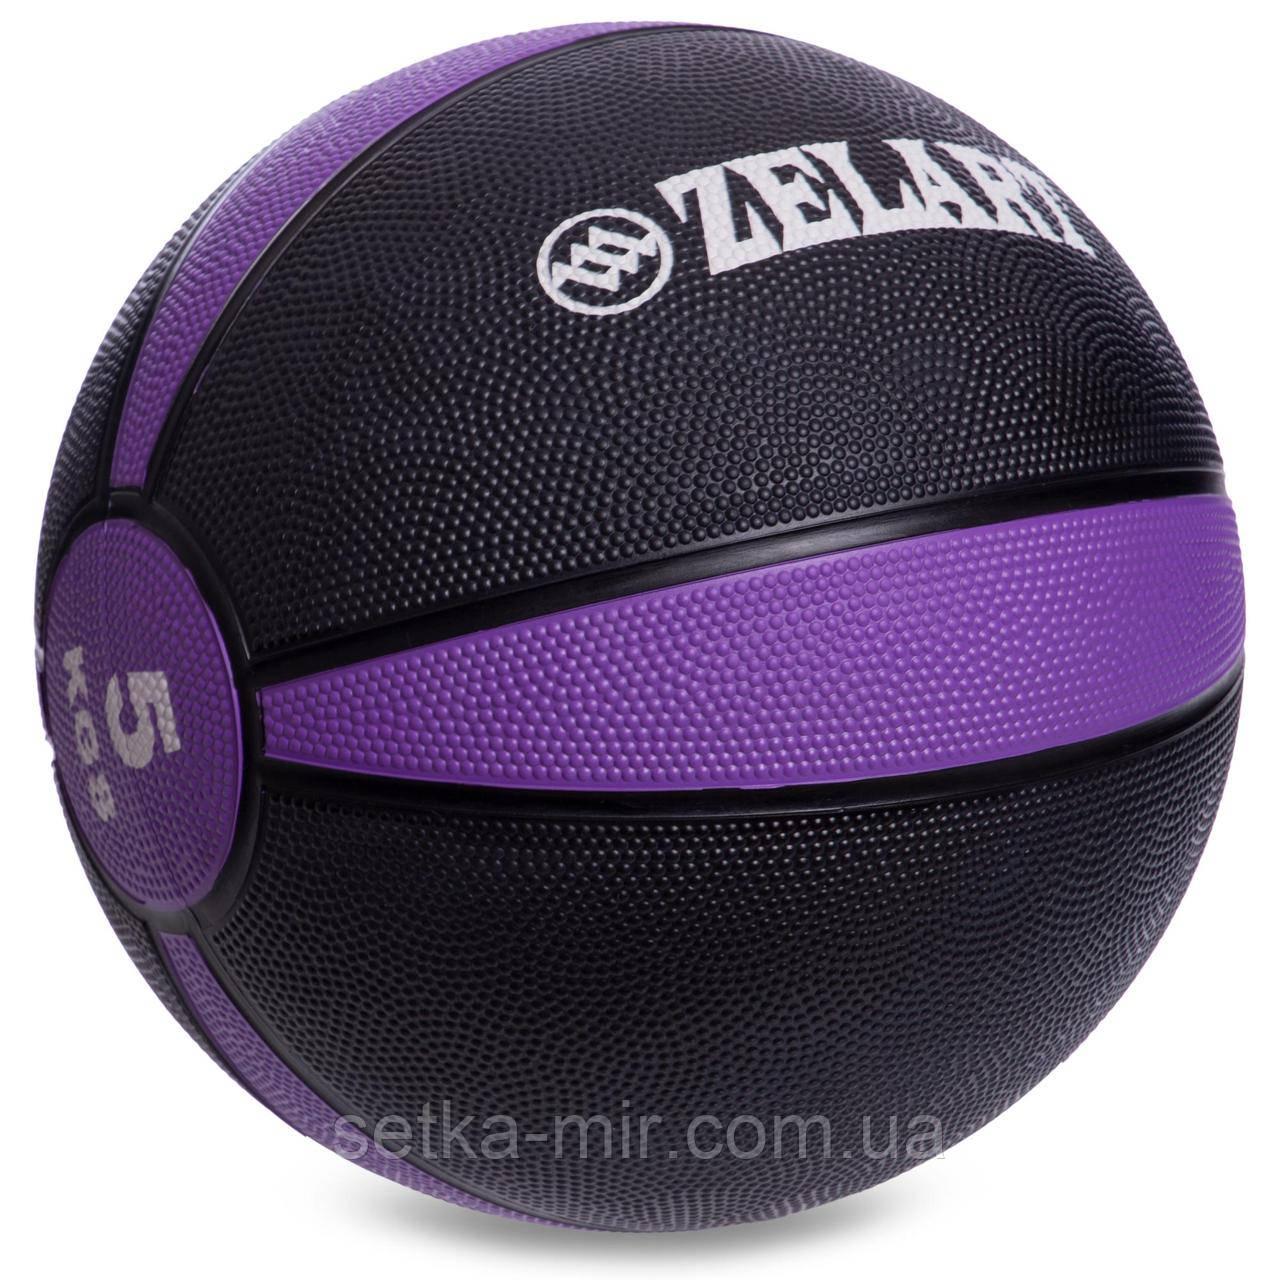 М'яч медичний медбол Zelart Medicine Ball FI-5122-5 5кг